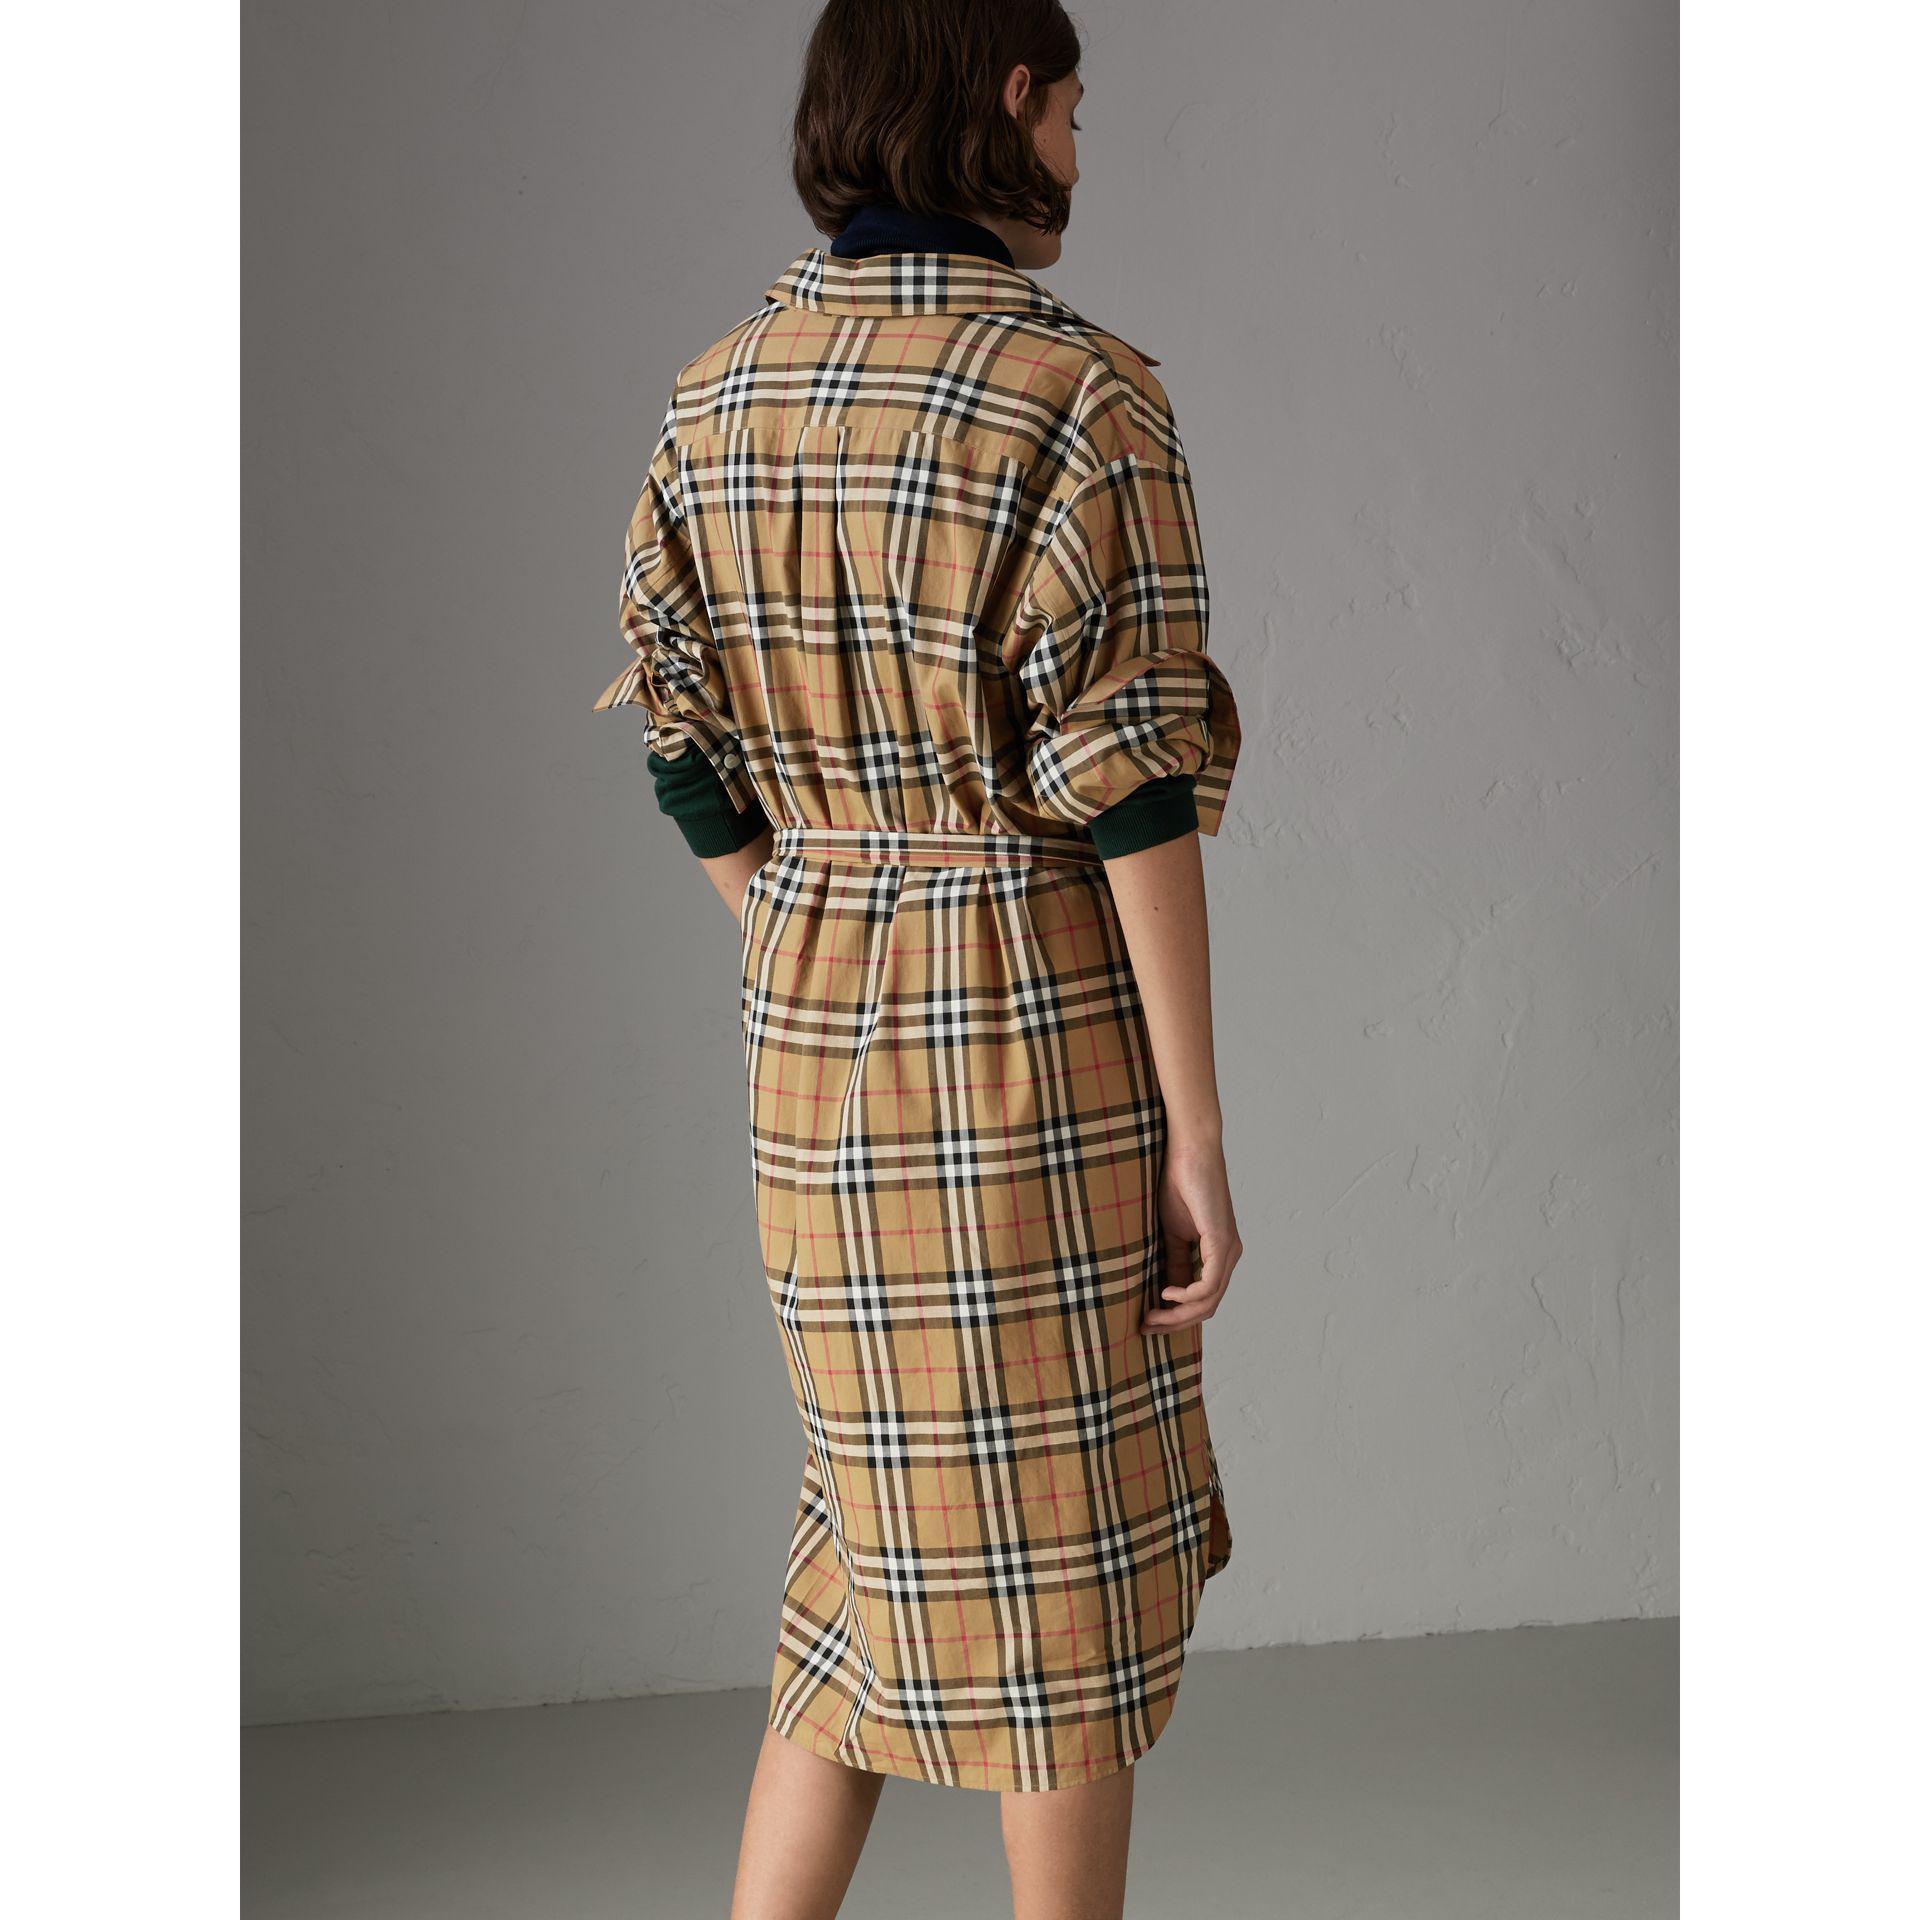 Lyst - Burberry Tie-waist Vintage Check Cotton Shirt Dress 41f9bae2cb2